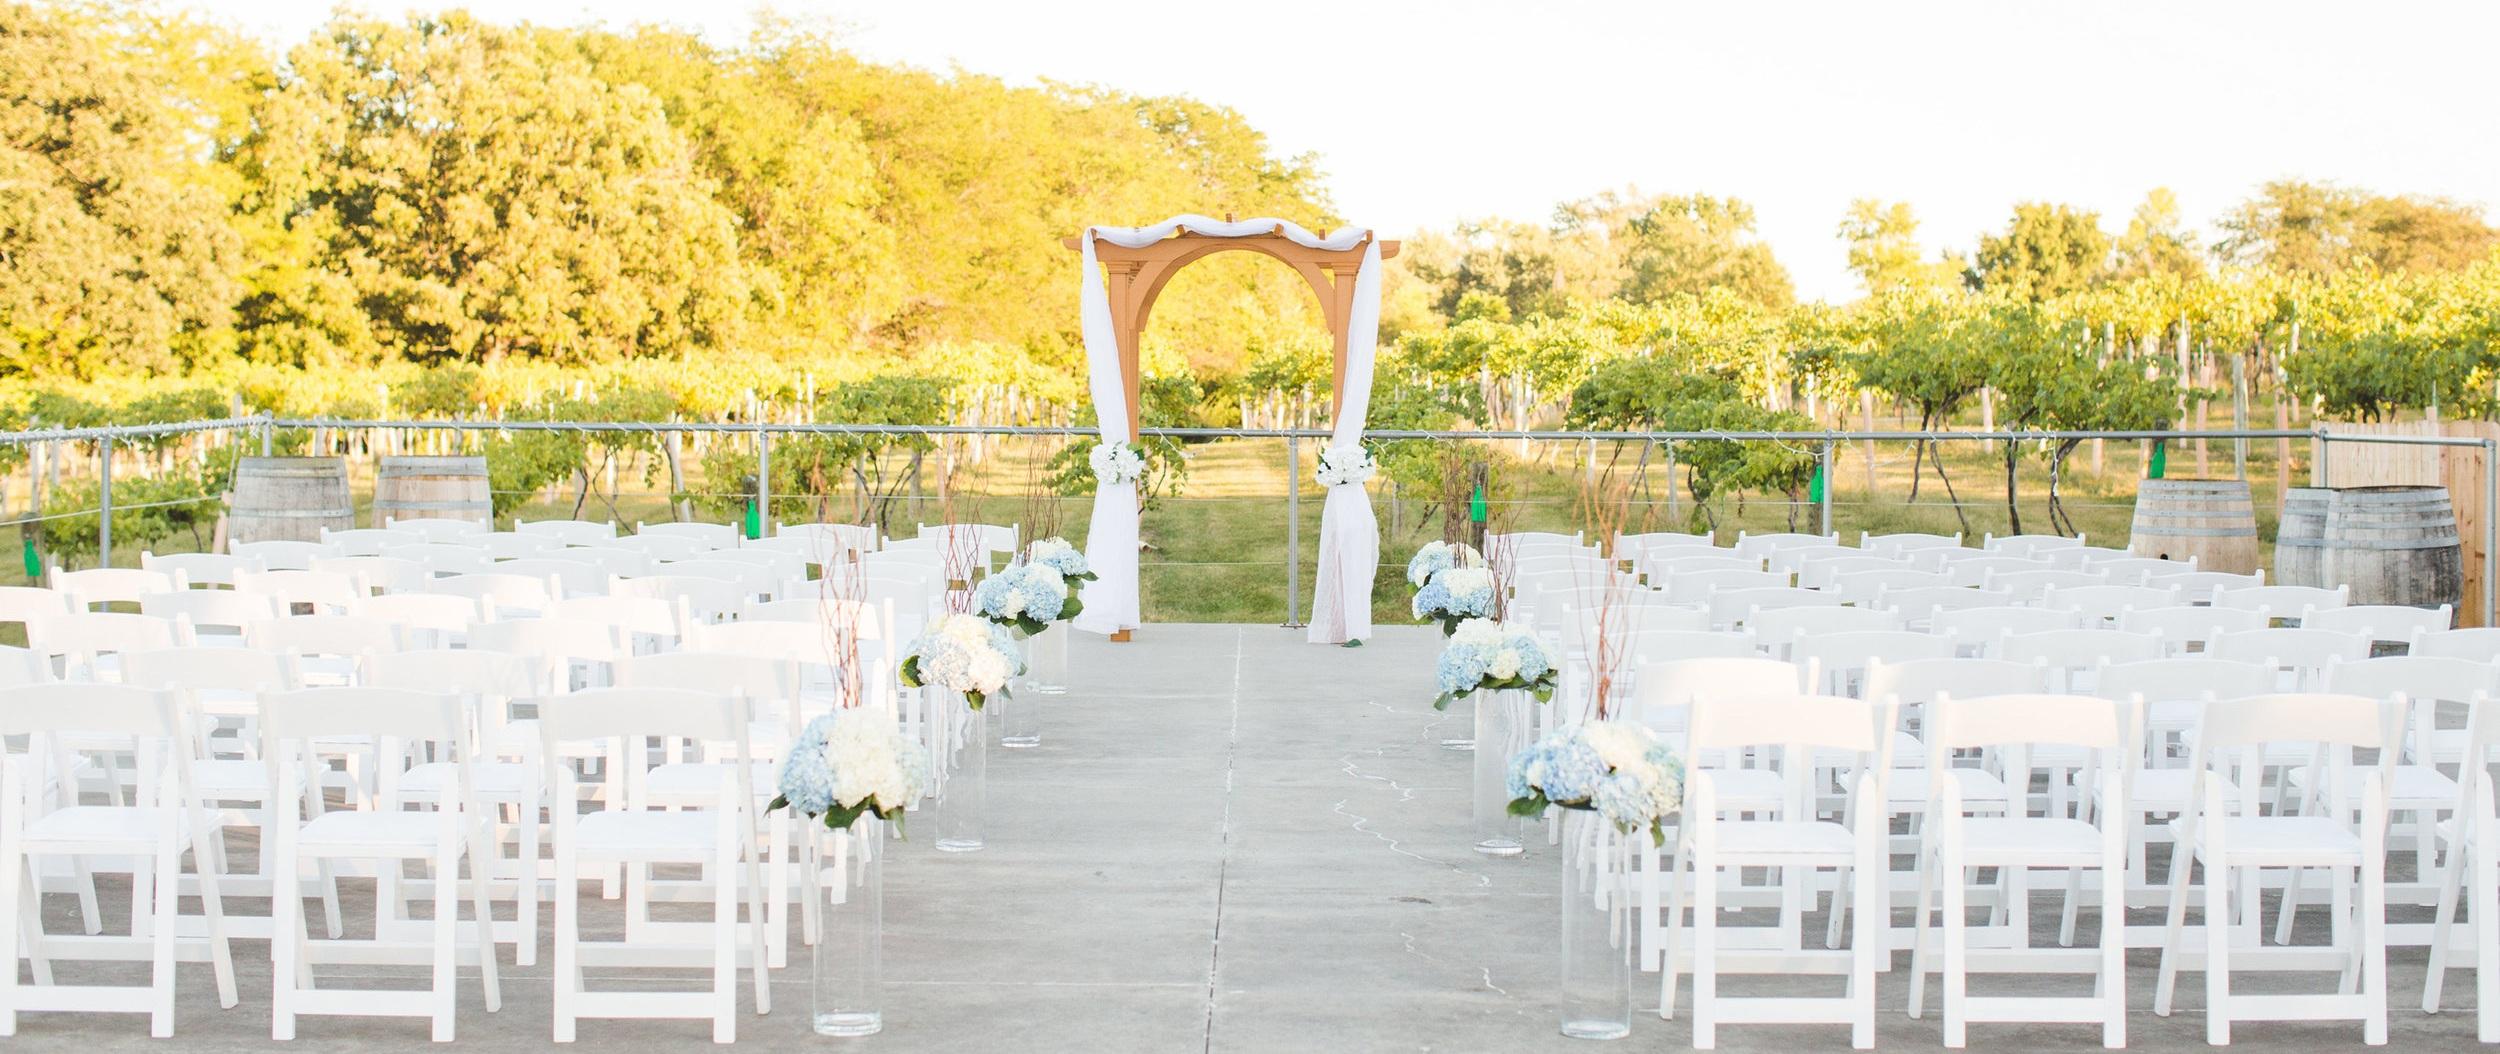 Aly+Caroll+outdoor+wedding-0403.jpg